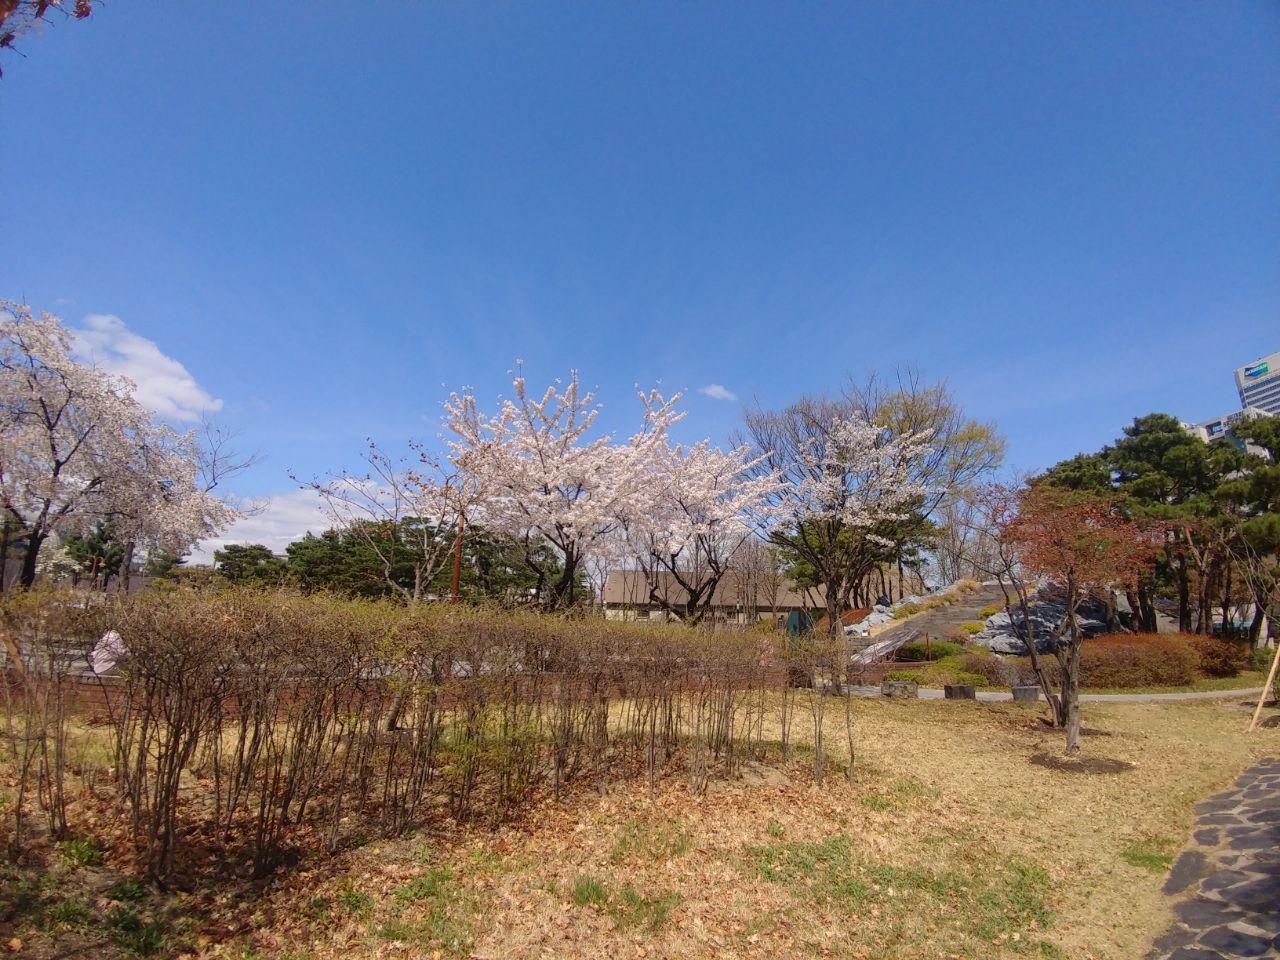 photo_2018-04-04_23-17-49.jpg